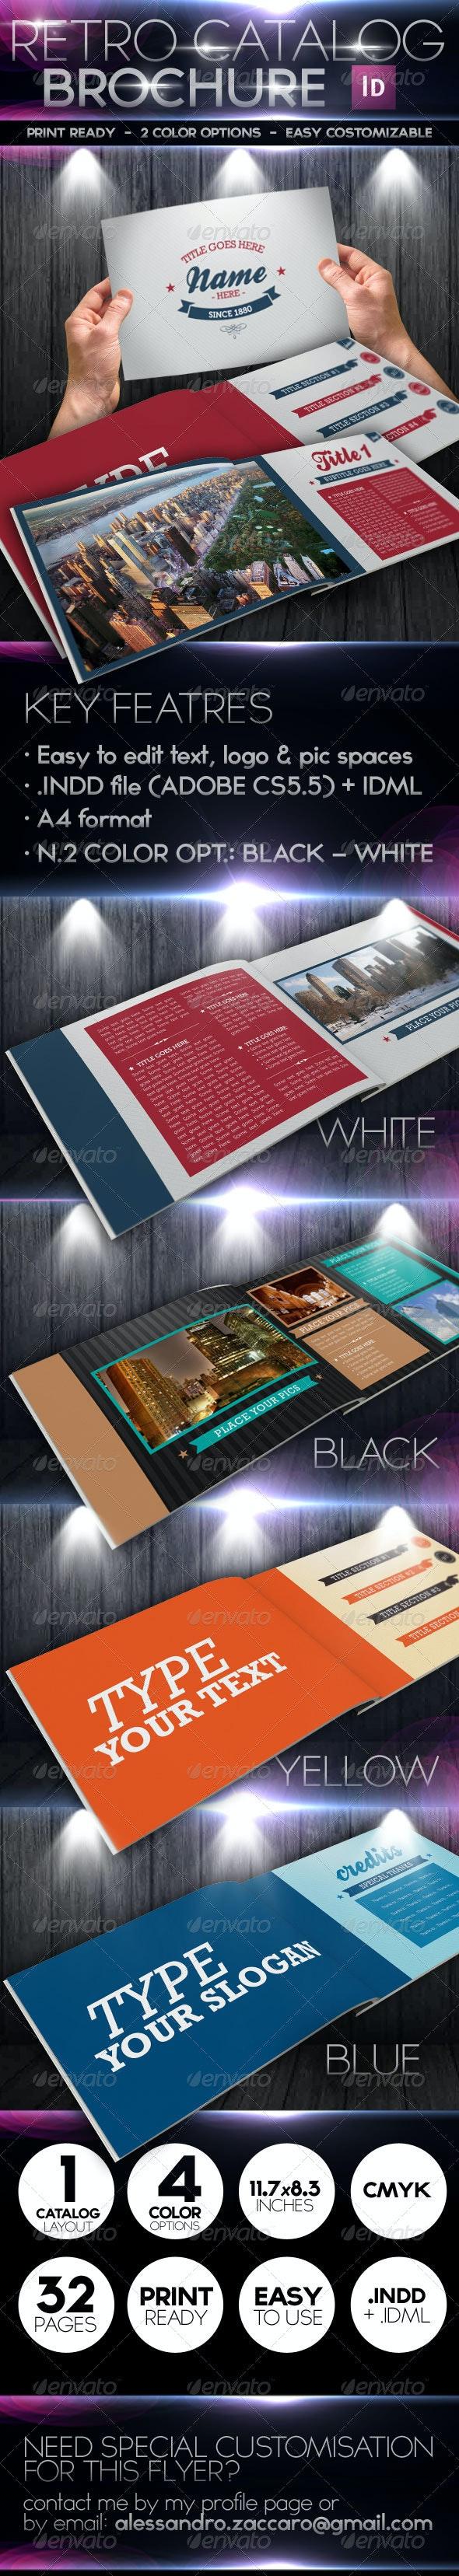 Retro Style Catalog Marketing Brochure - Brochures Print Templates